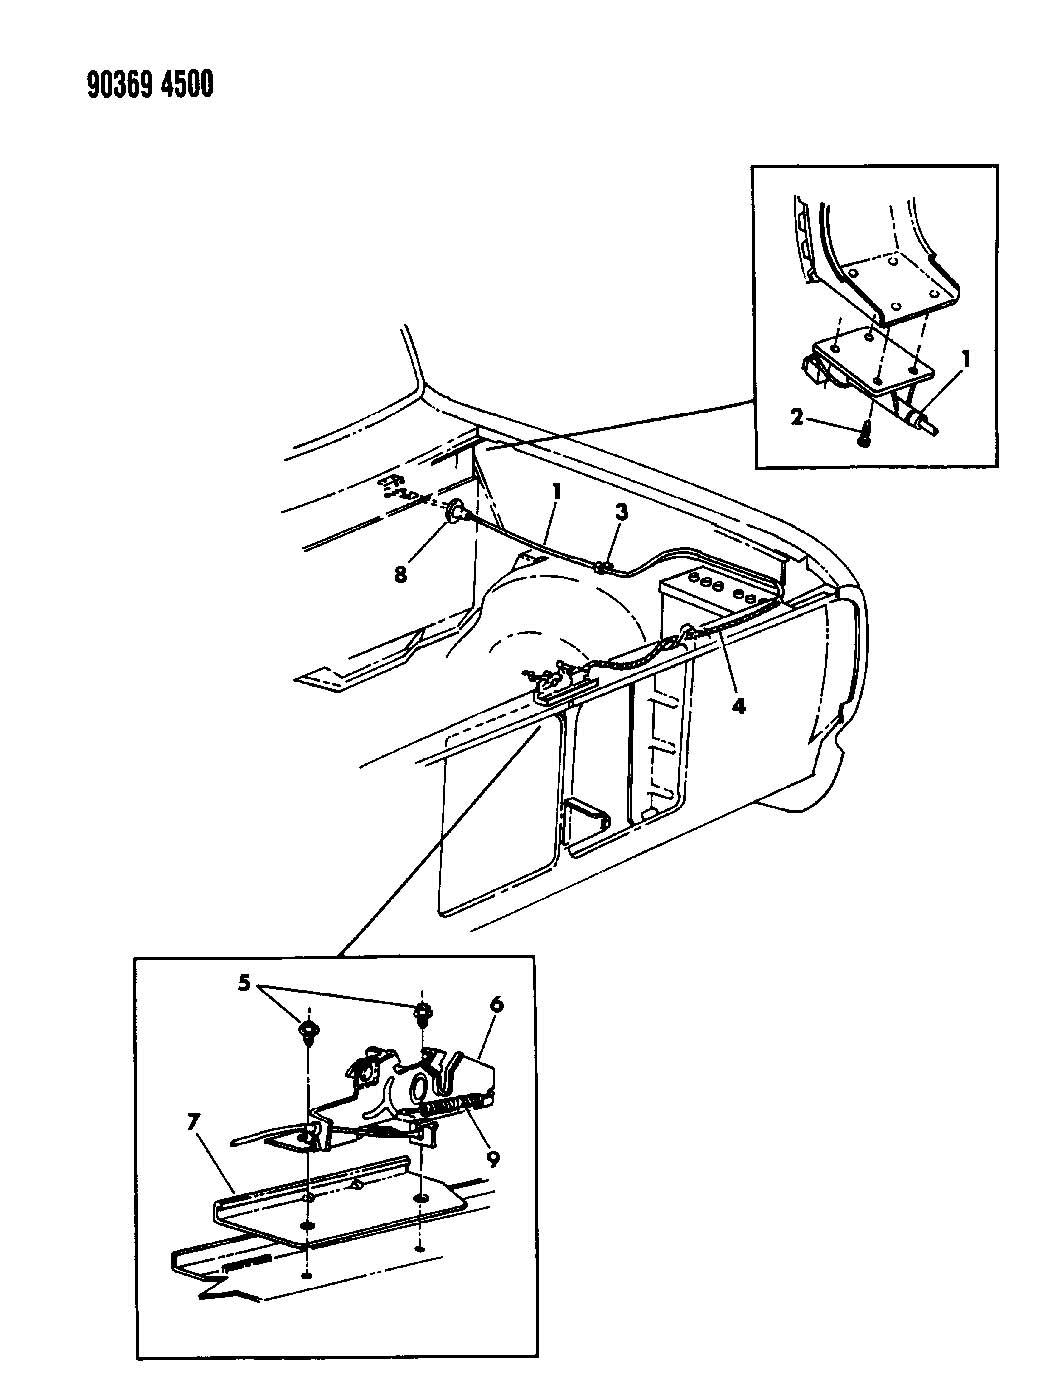 1991 Dodge Pick-Up/Sport Utility HOOD LATCH RELEASE